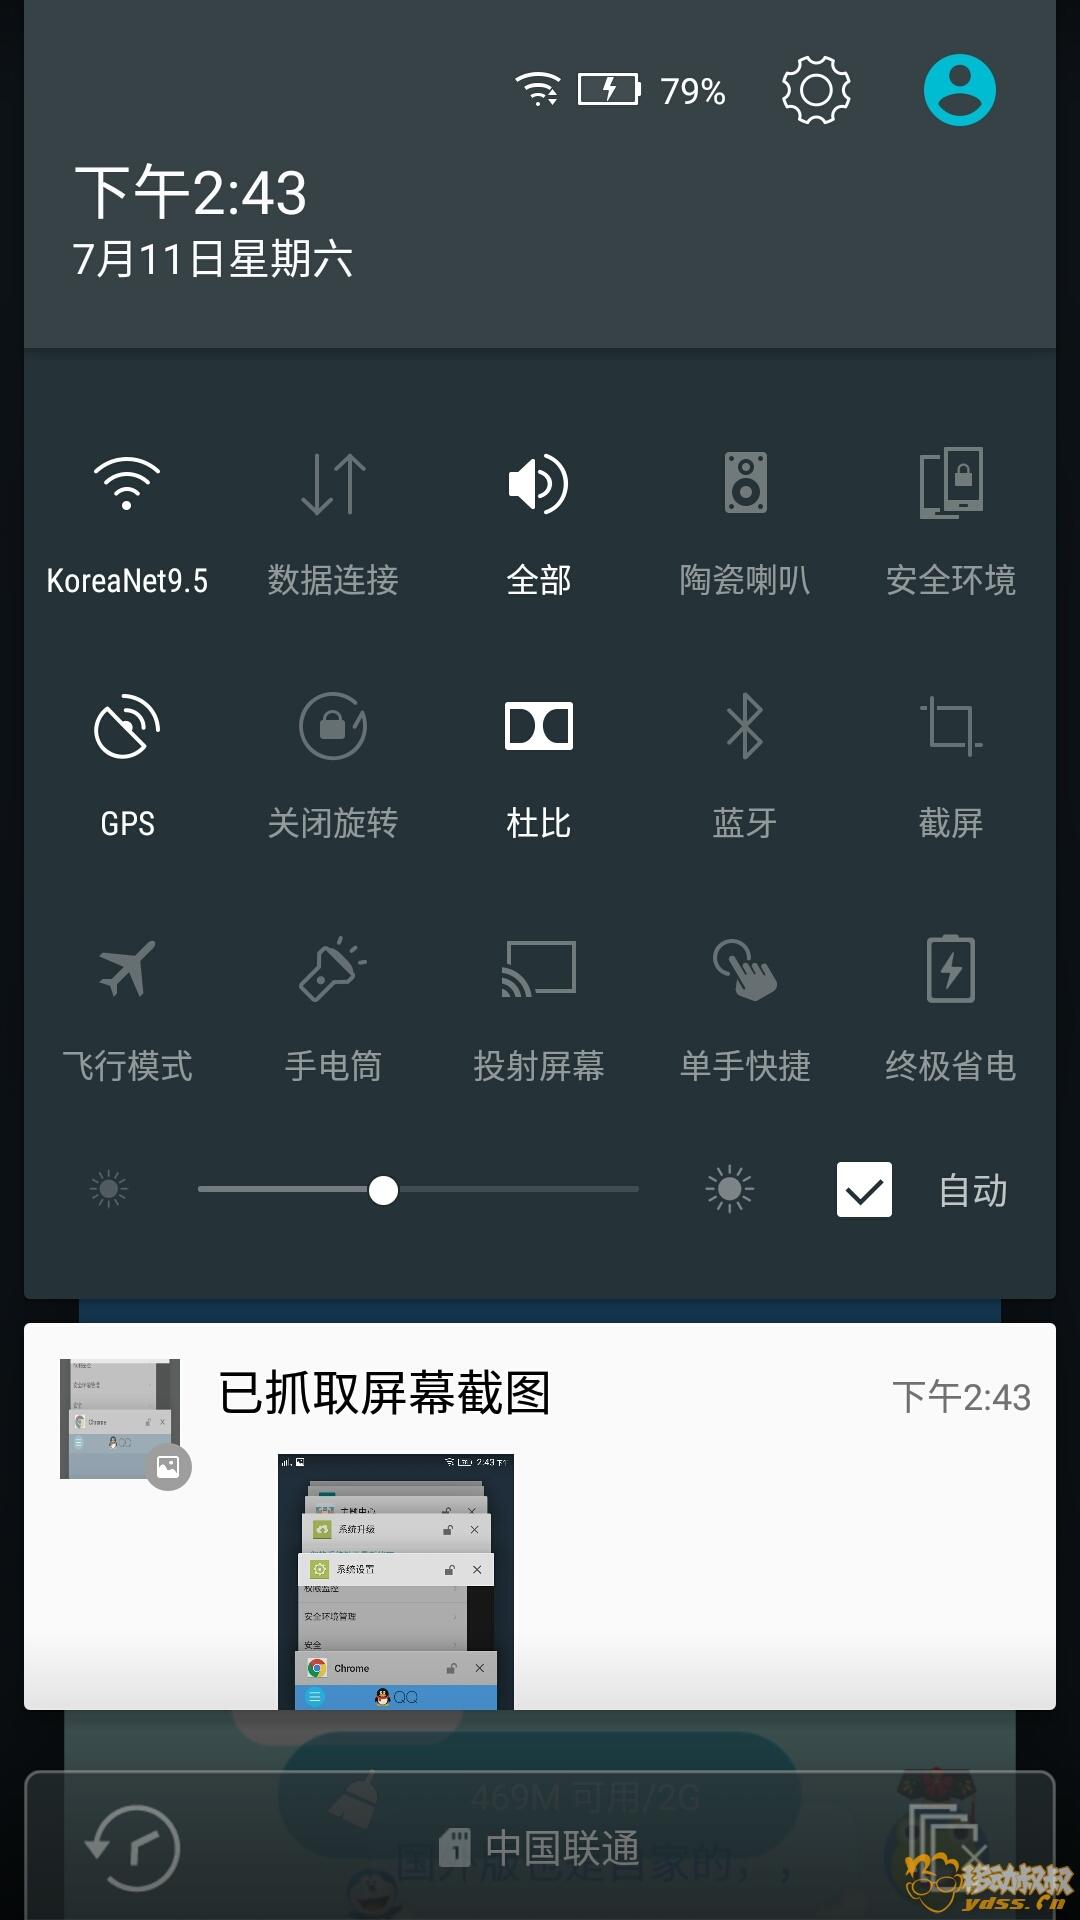 Screenshot_2015-07-11-14-43-58-539.jpeg